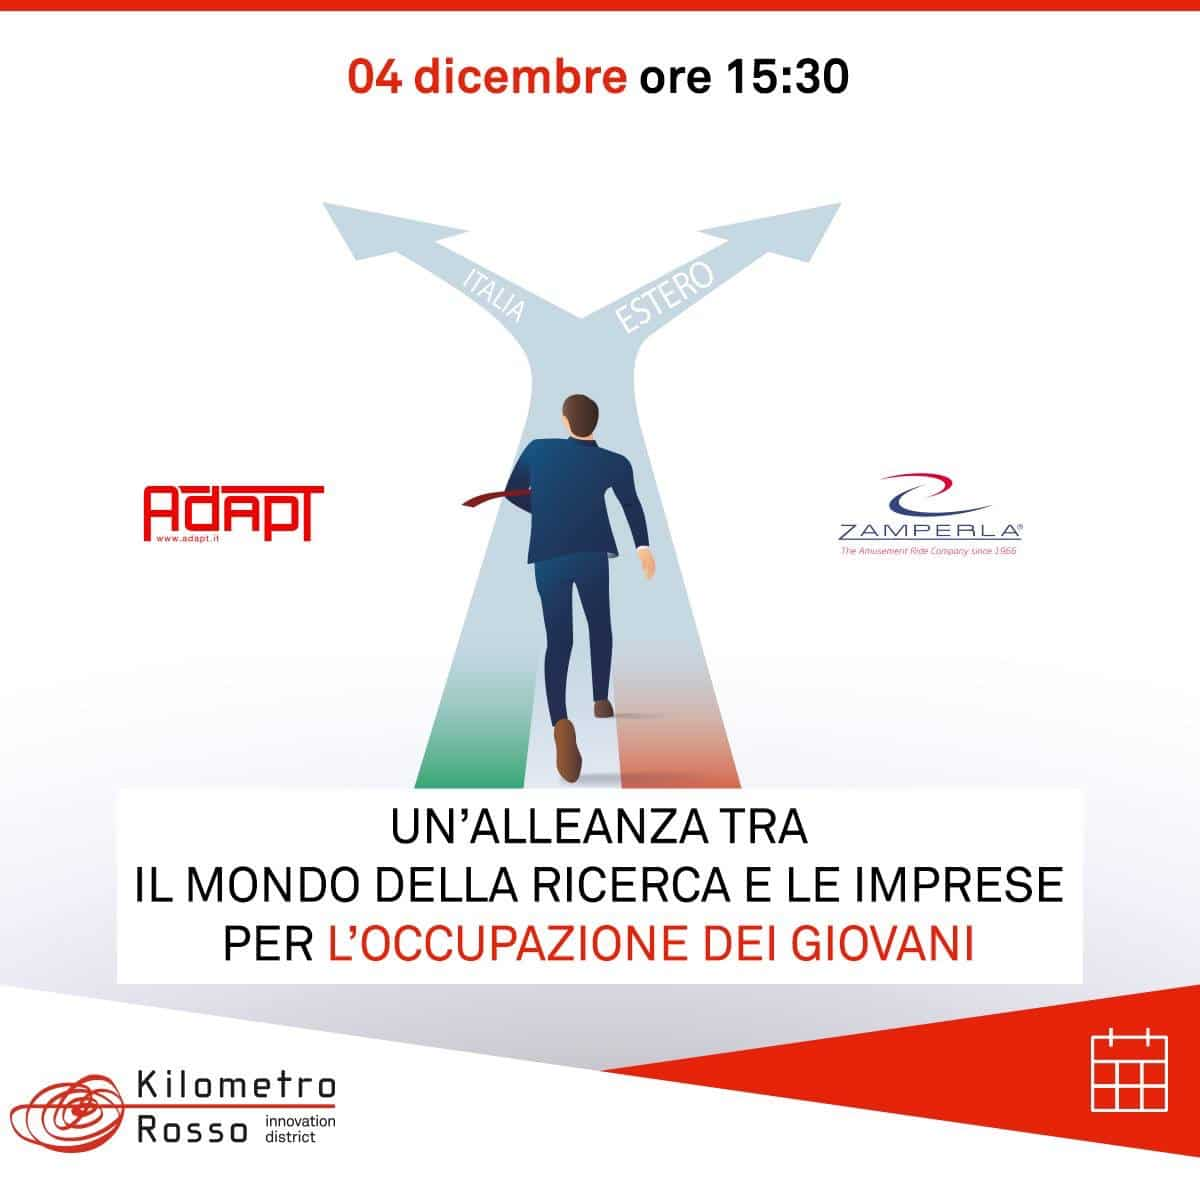 Antonio Zamperla S.p.A. insieme ad ADAPT